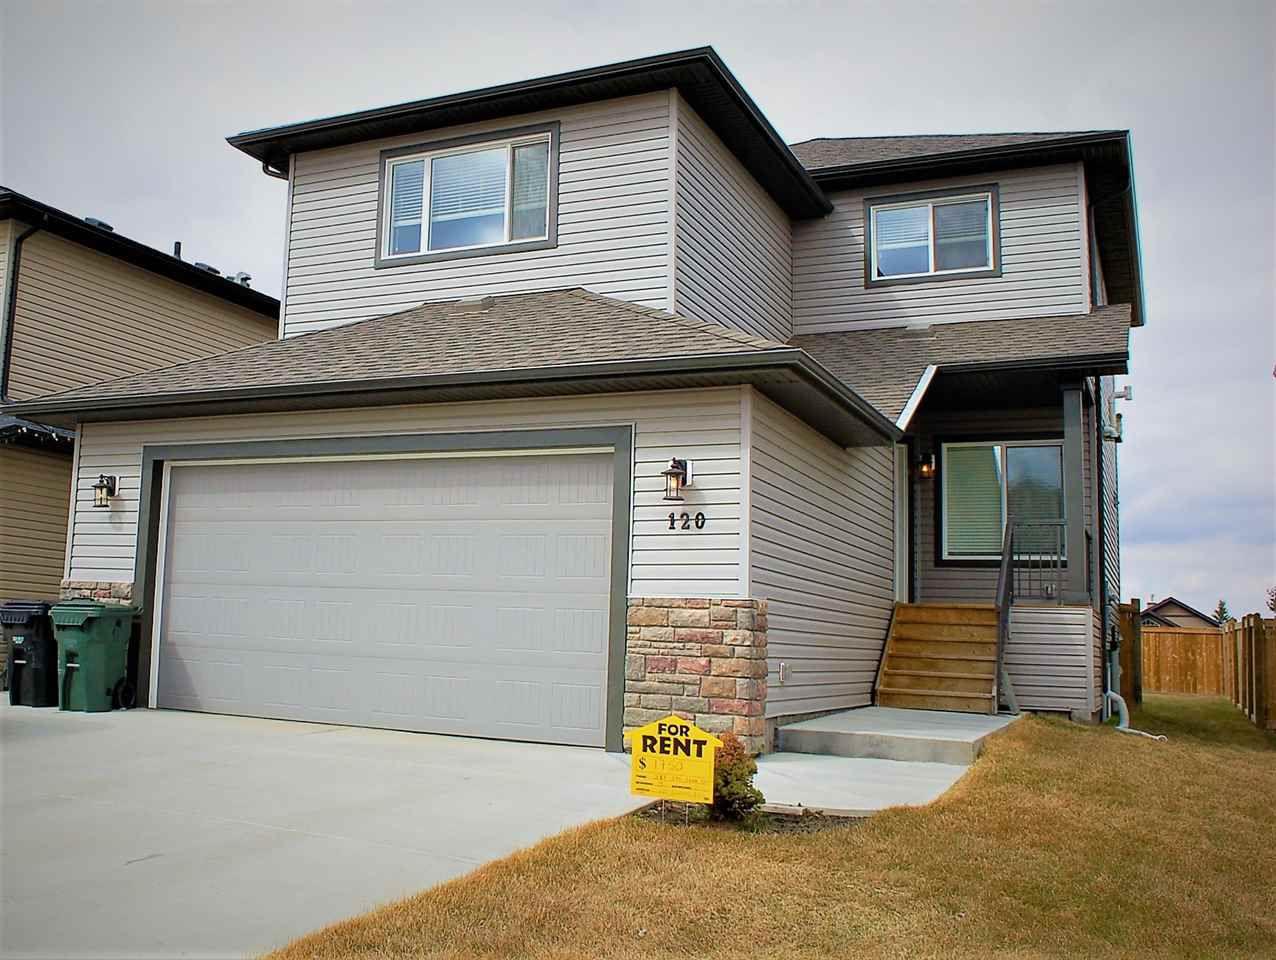 Main Photo: 120 HILLDOWNS Drive: Spruce Grove House for sale : MLS®# E4150049